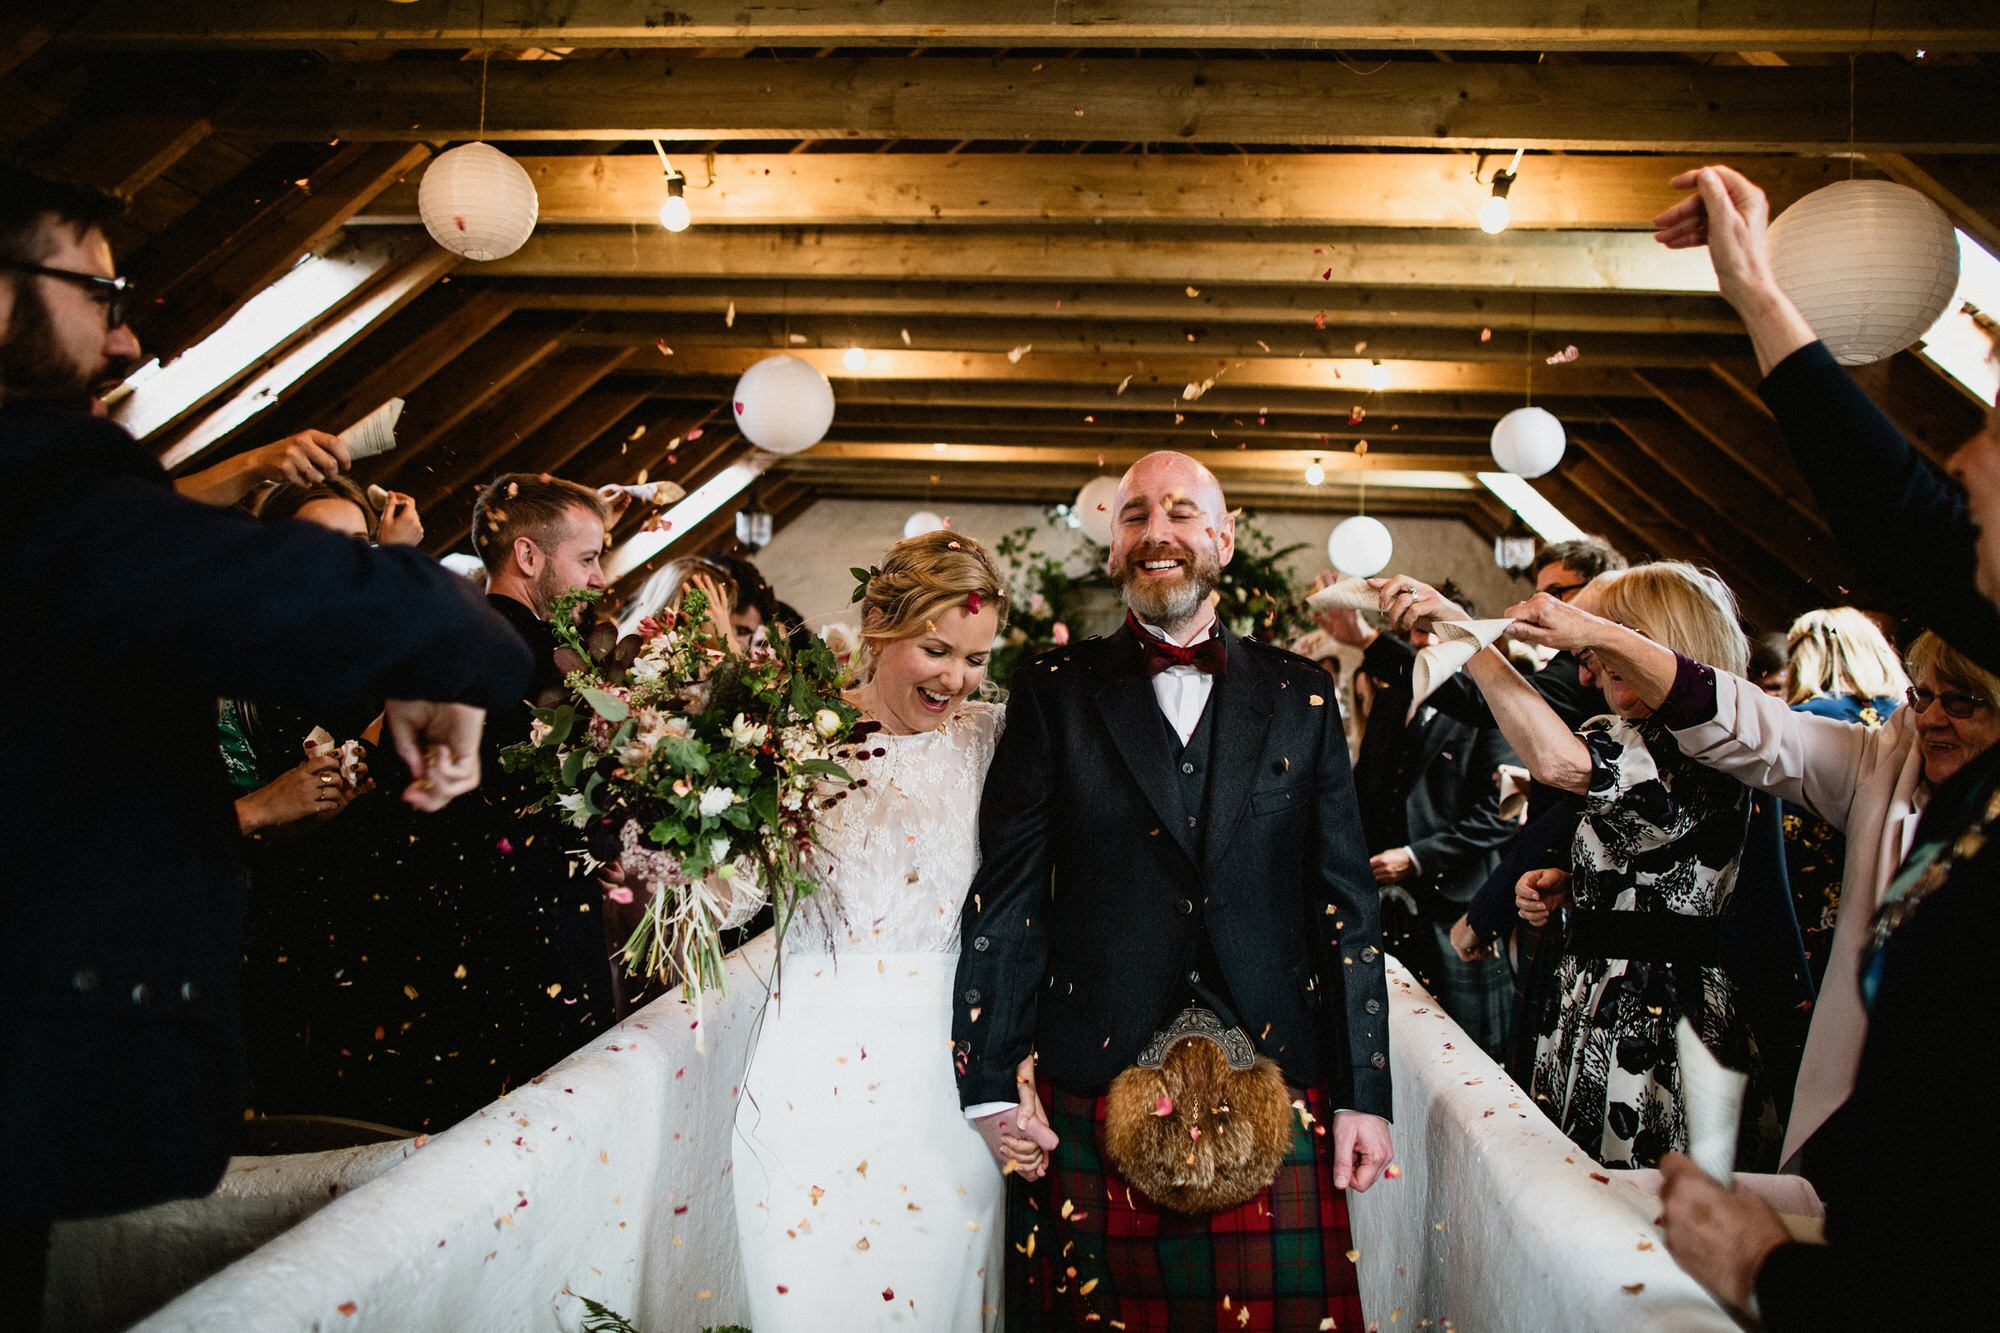 022 TIN SHED KNOCKRAICH WEDDING AUTUMN ZOE ALEXANDRA PHOTOGRAPHY